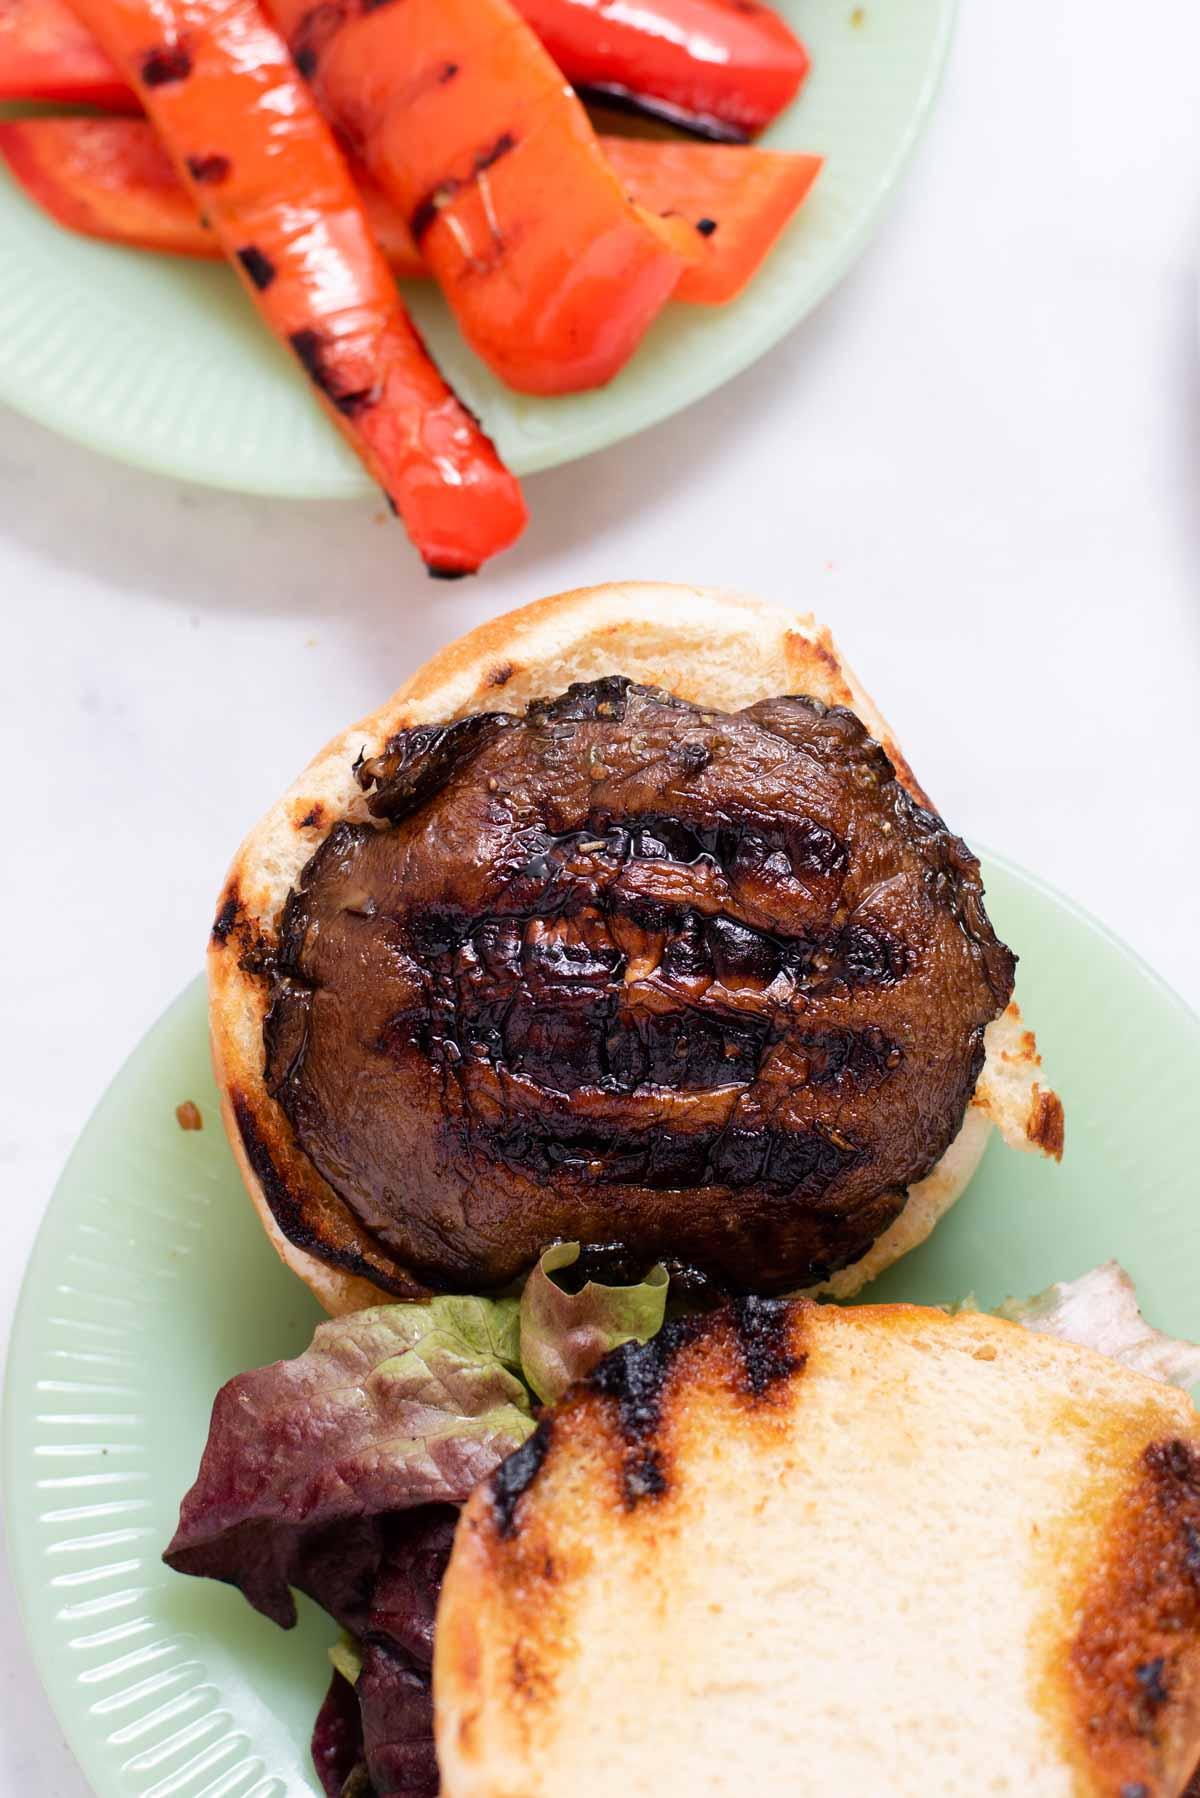 Overhead view of mushroom cap on a toasted bun on a jade plate